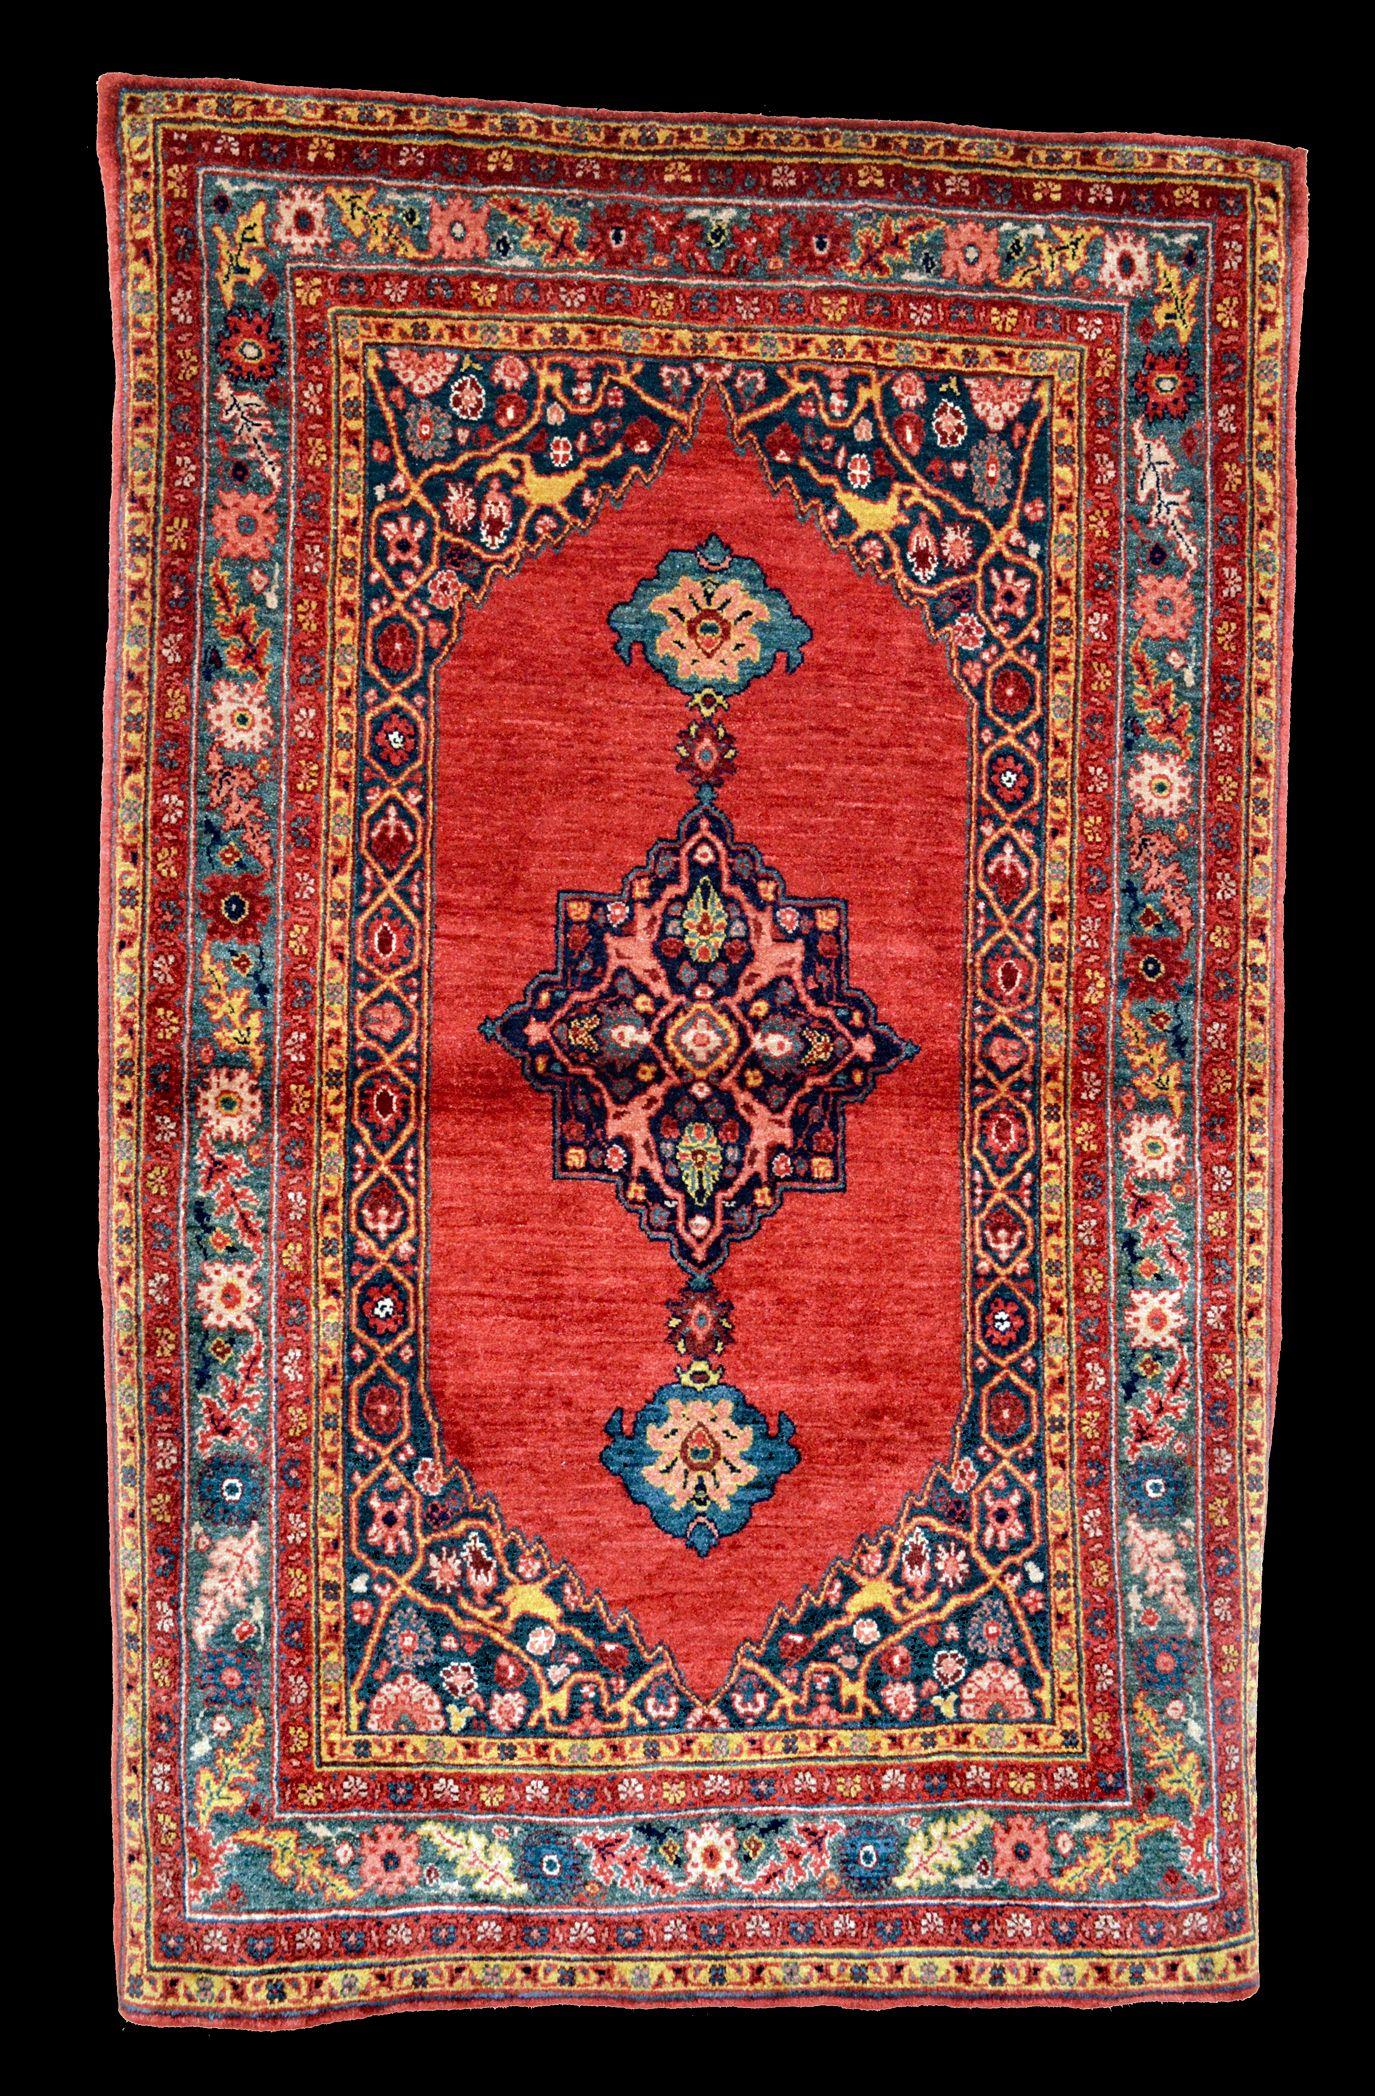 Quadrifoglio Gallery Oriental Rugs Boston Ma Wellesley Natick Area A New Genuine Persian Bidjar Rug Hand Woven Utilizing Natural Dyes And Spun Wool